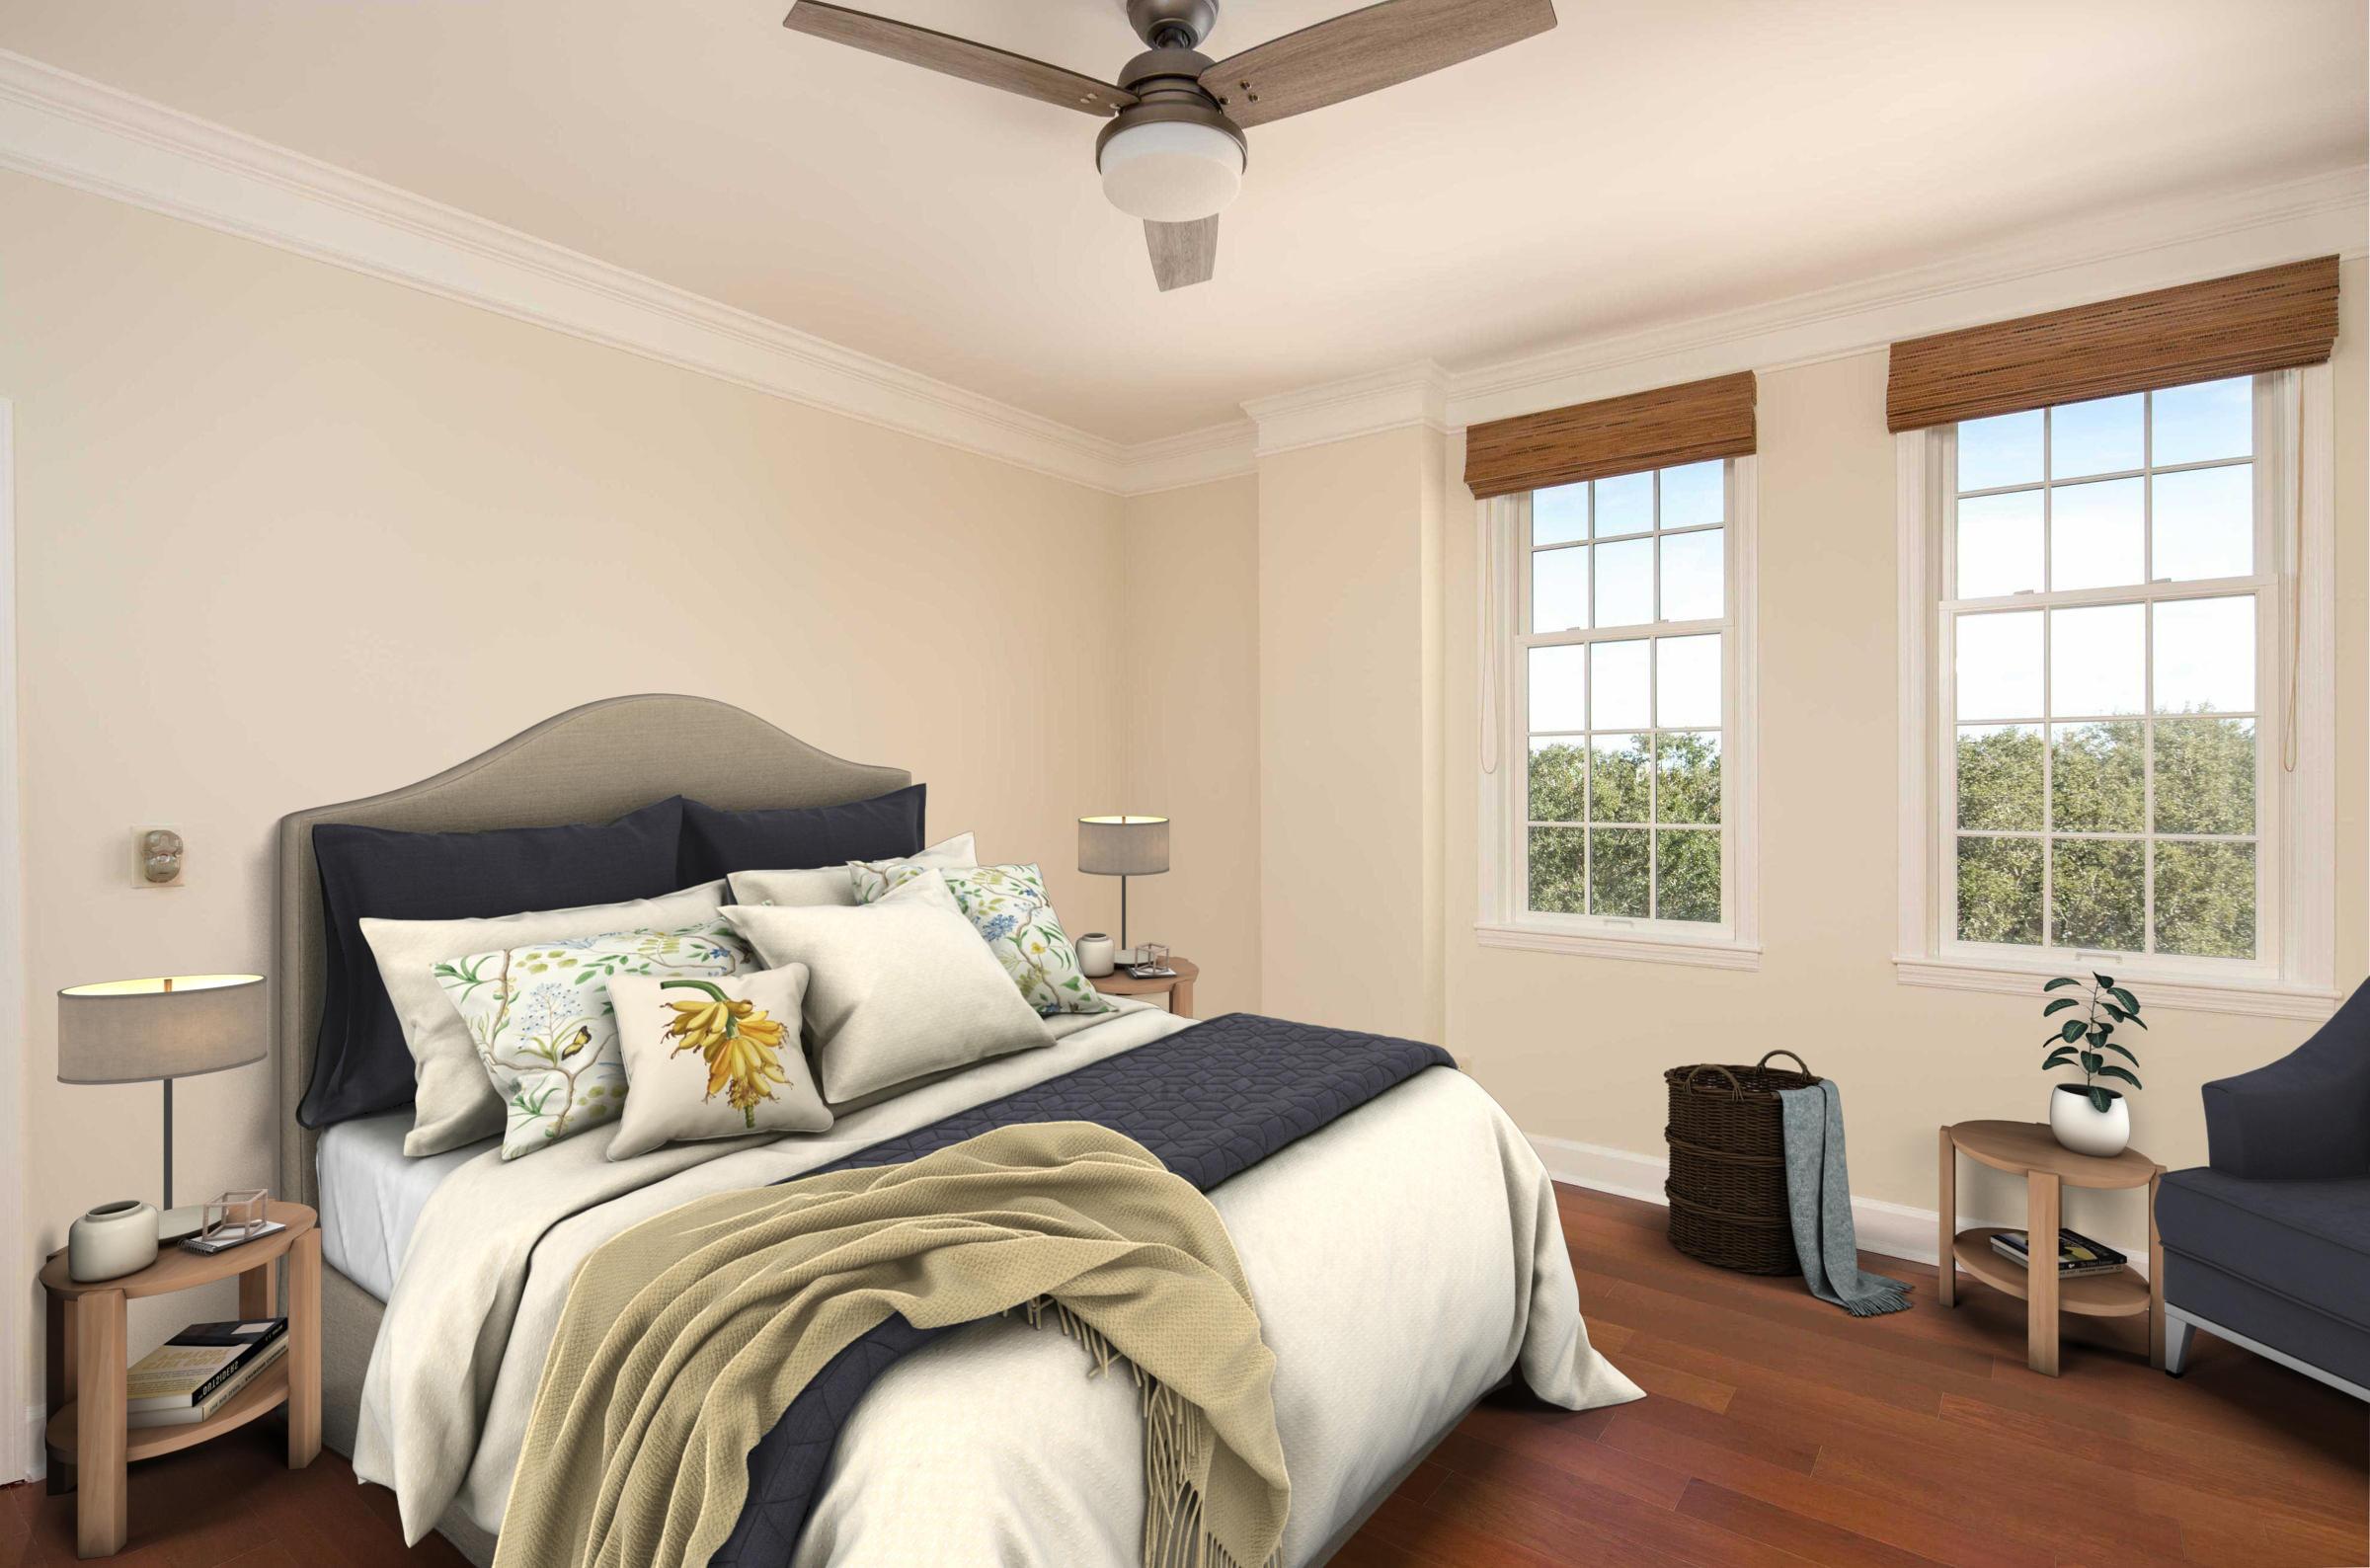 Fort Sumter House Homes For Sale - 1 King, Charleston, SC - 14